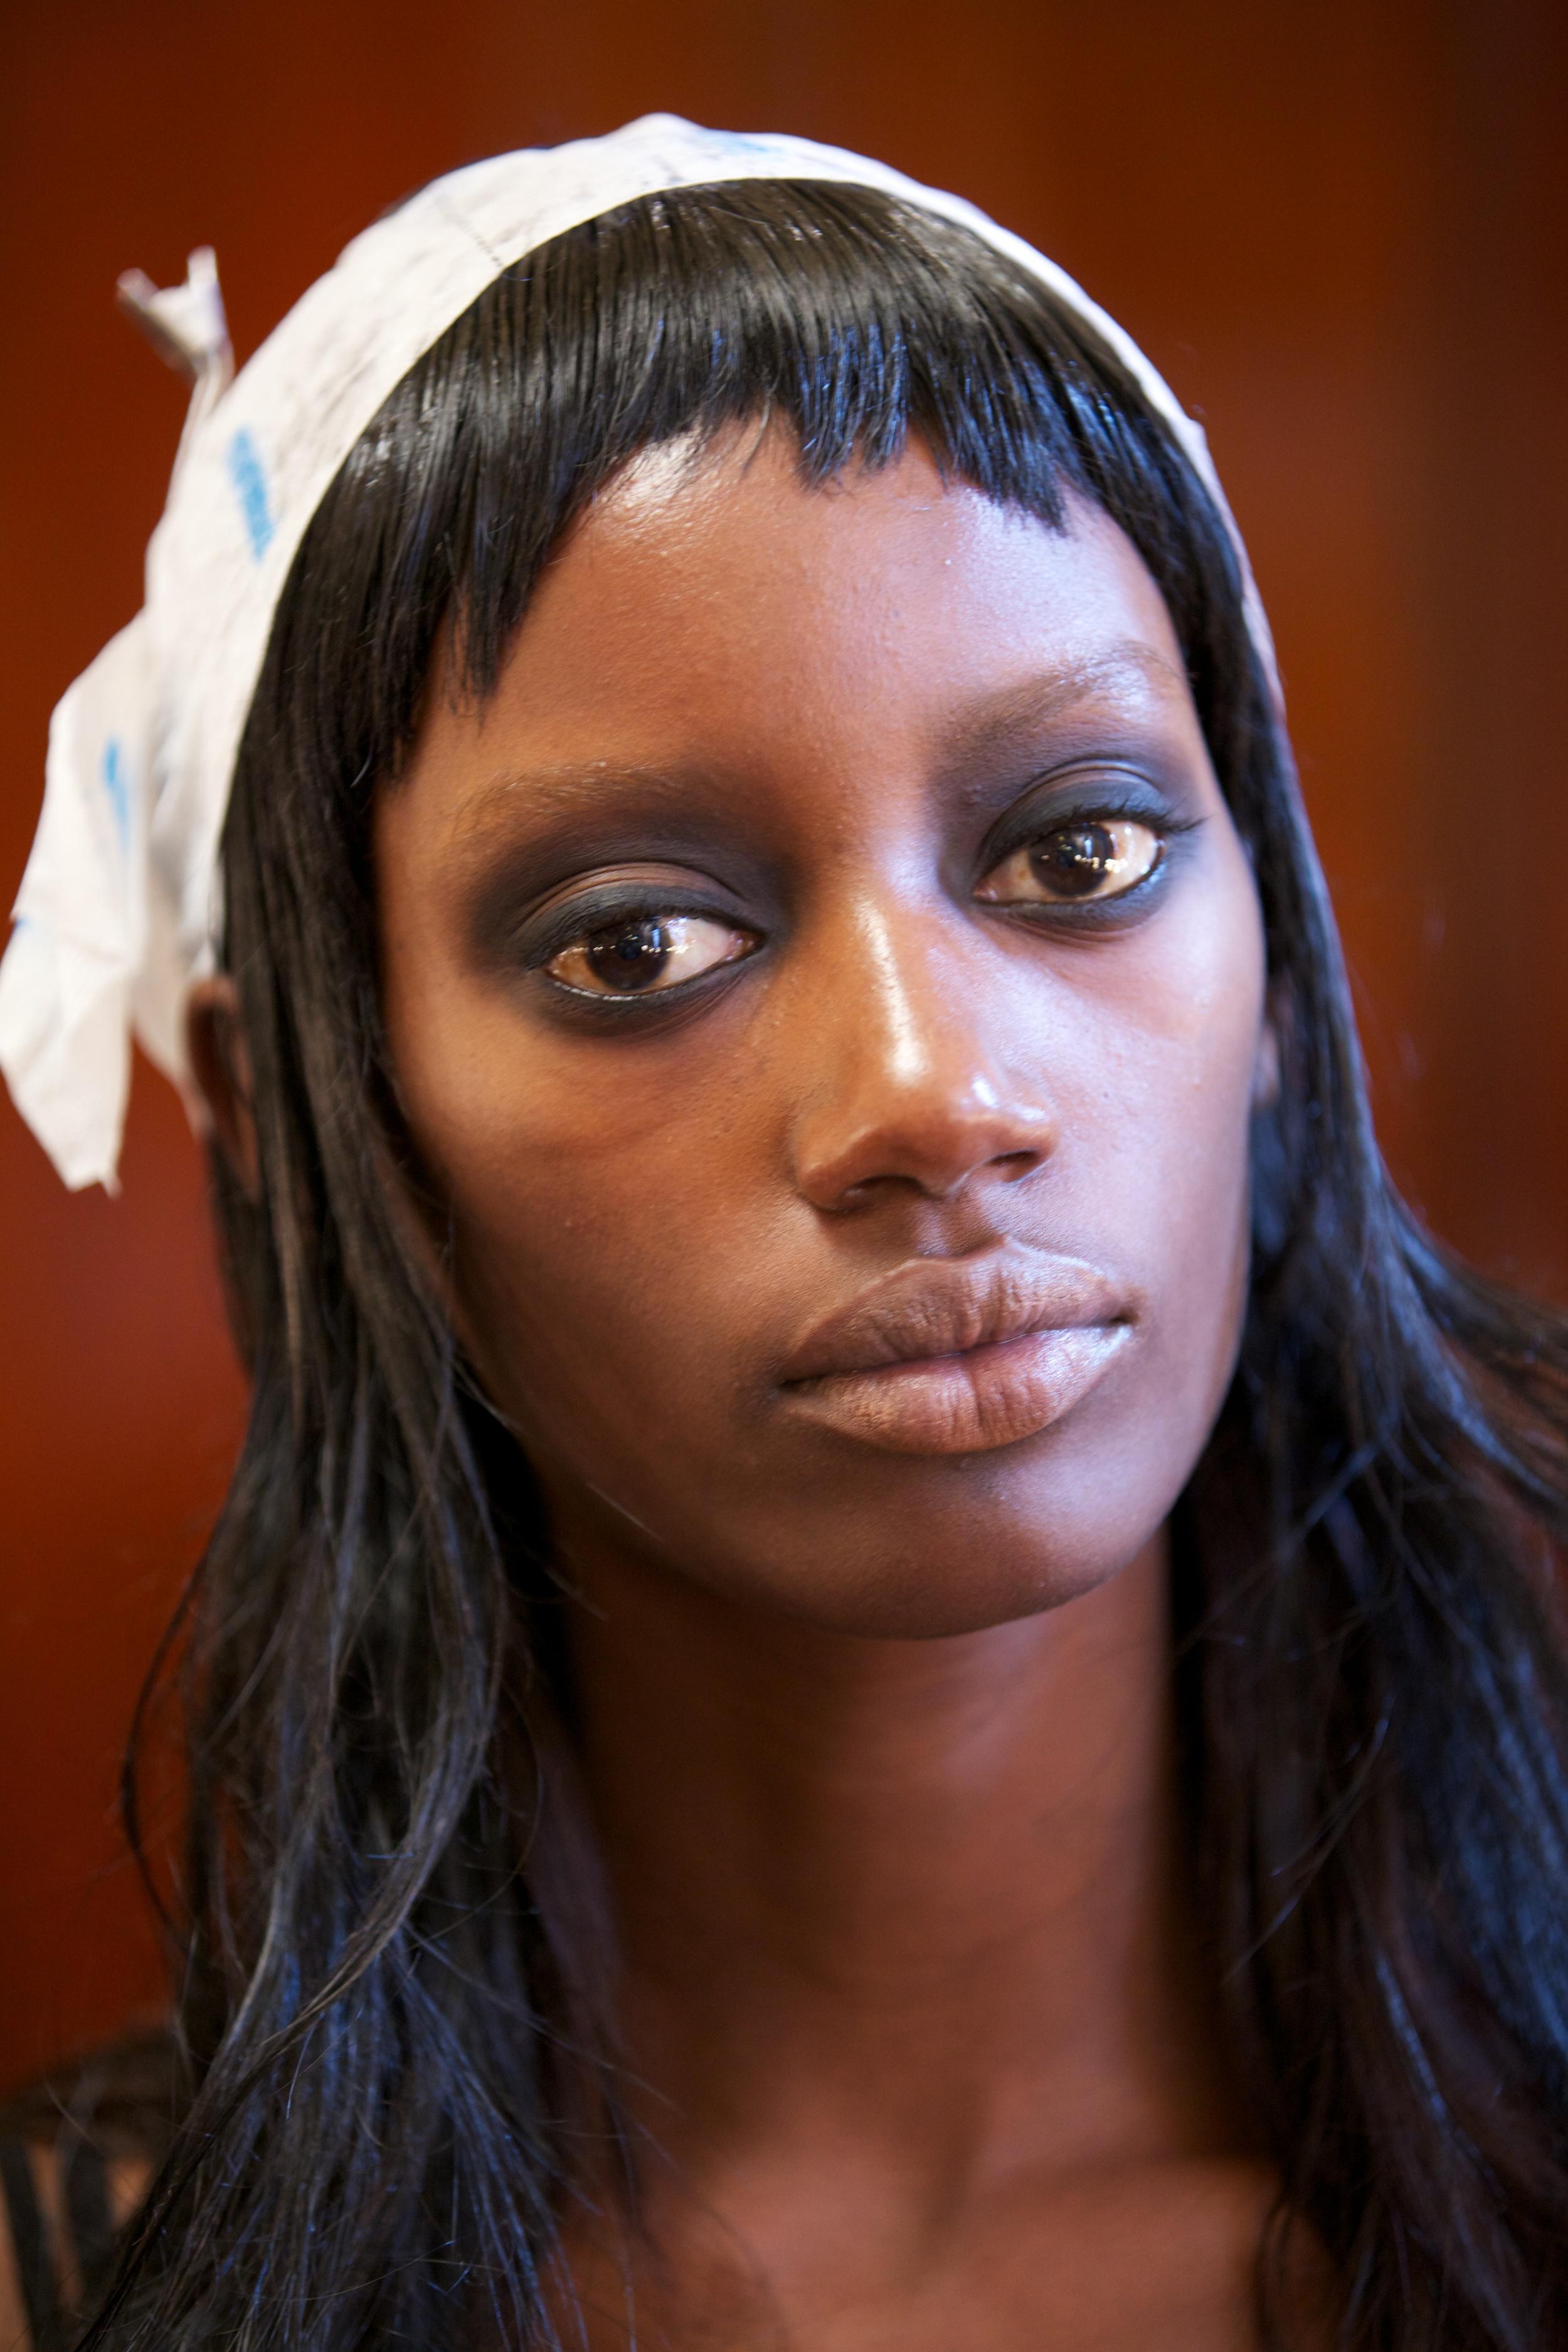 Dora Abodi SS 15 © Marc Aitken 2015 . www.marcaitken.com 2014-09-132014 (34).jpg